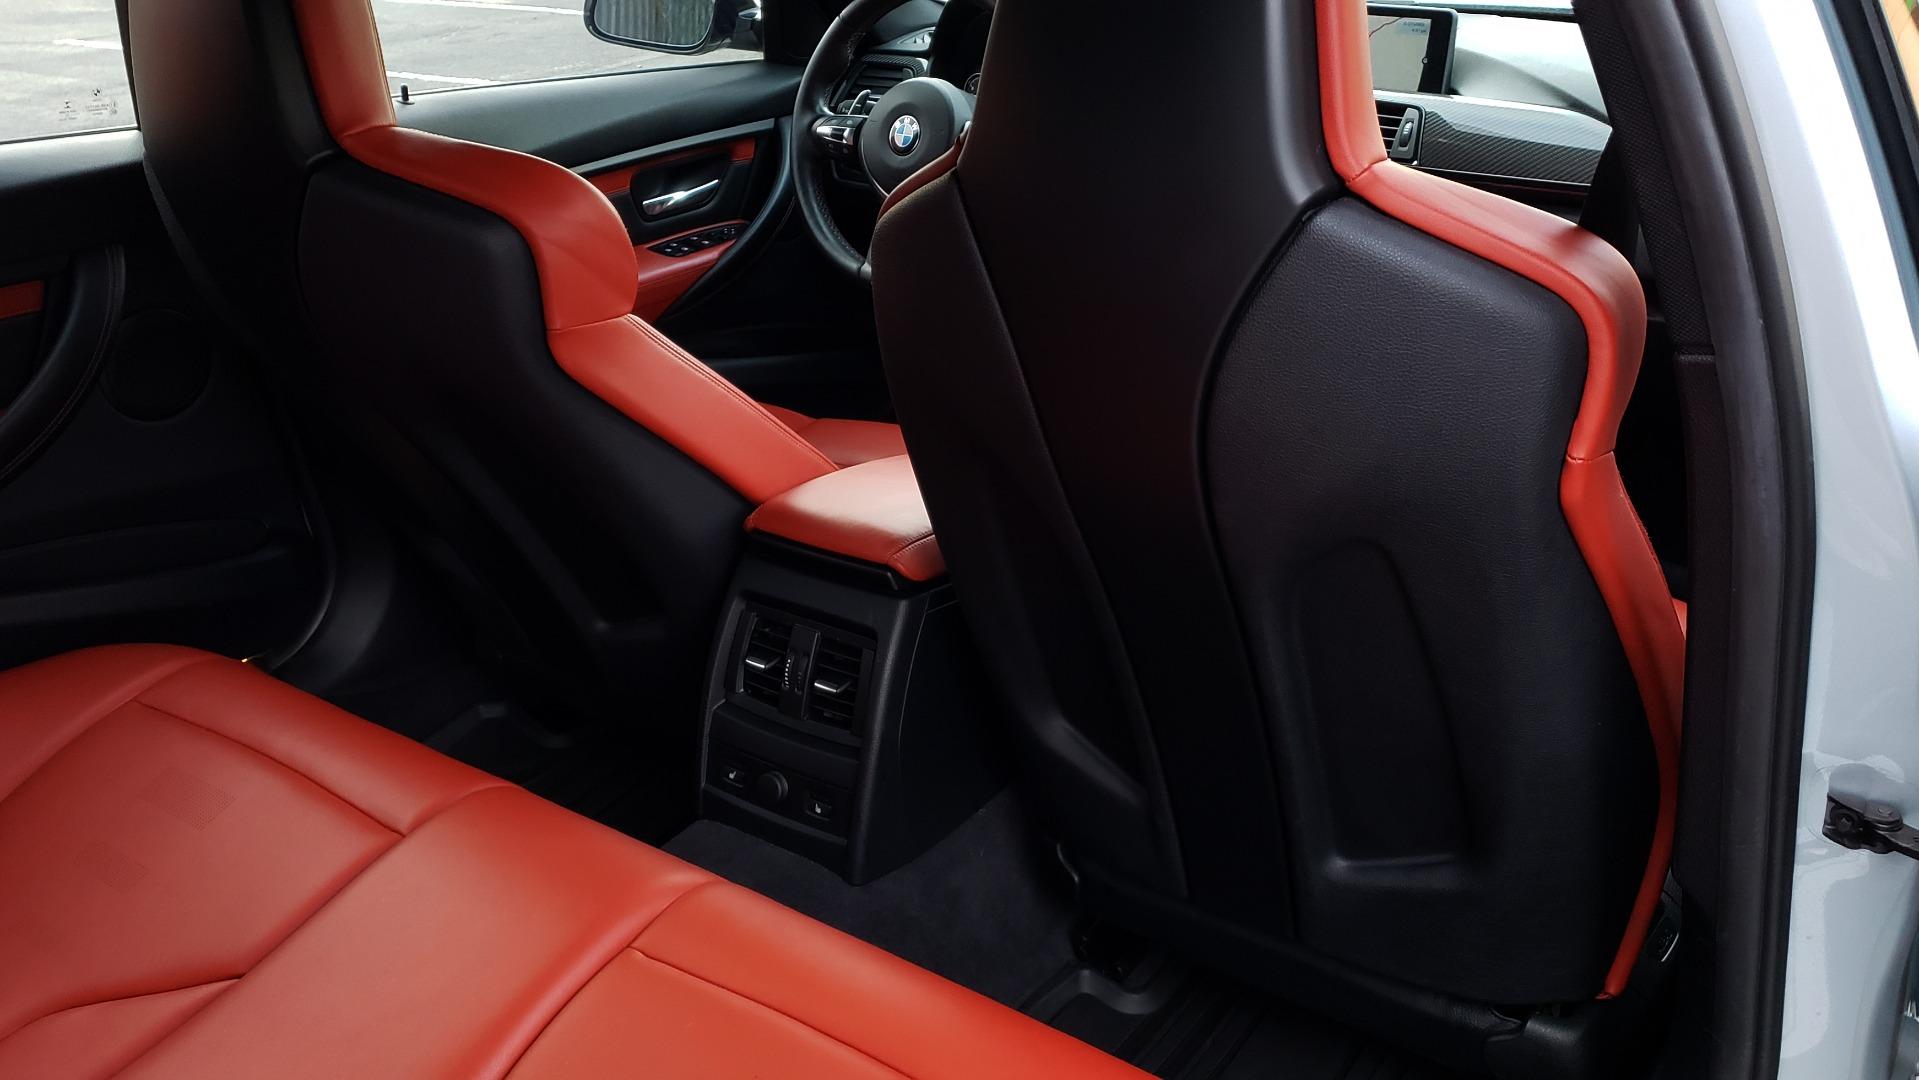 Used 2015 BMW M3 EXECUTIVE PKG / NAV / CAMERA / HUD / CARBON FIBER ROOF for sale Sold at Formula Imports in Charlotte NC 28227 85